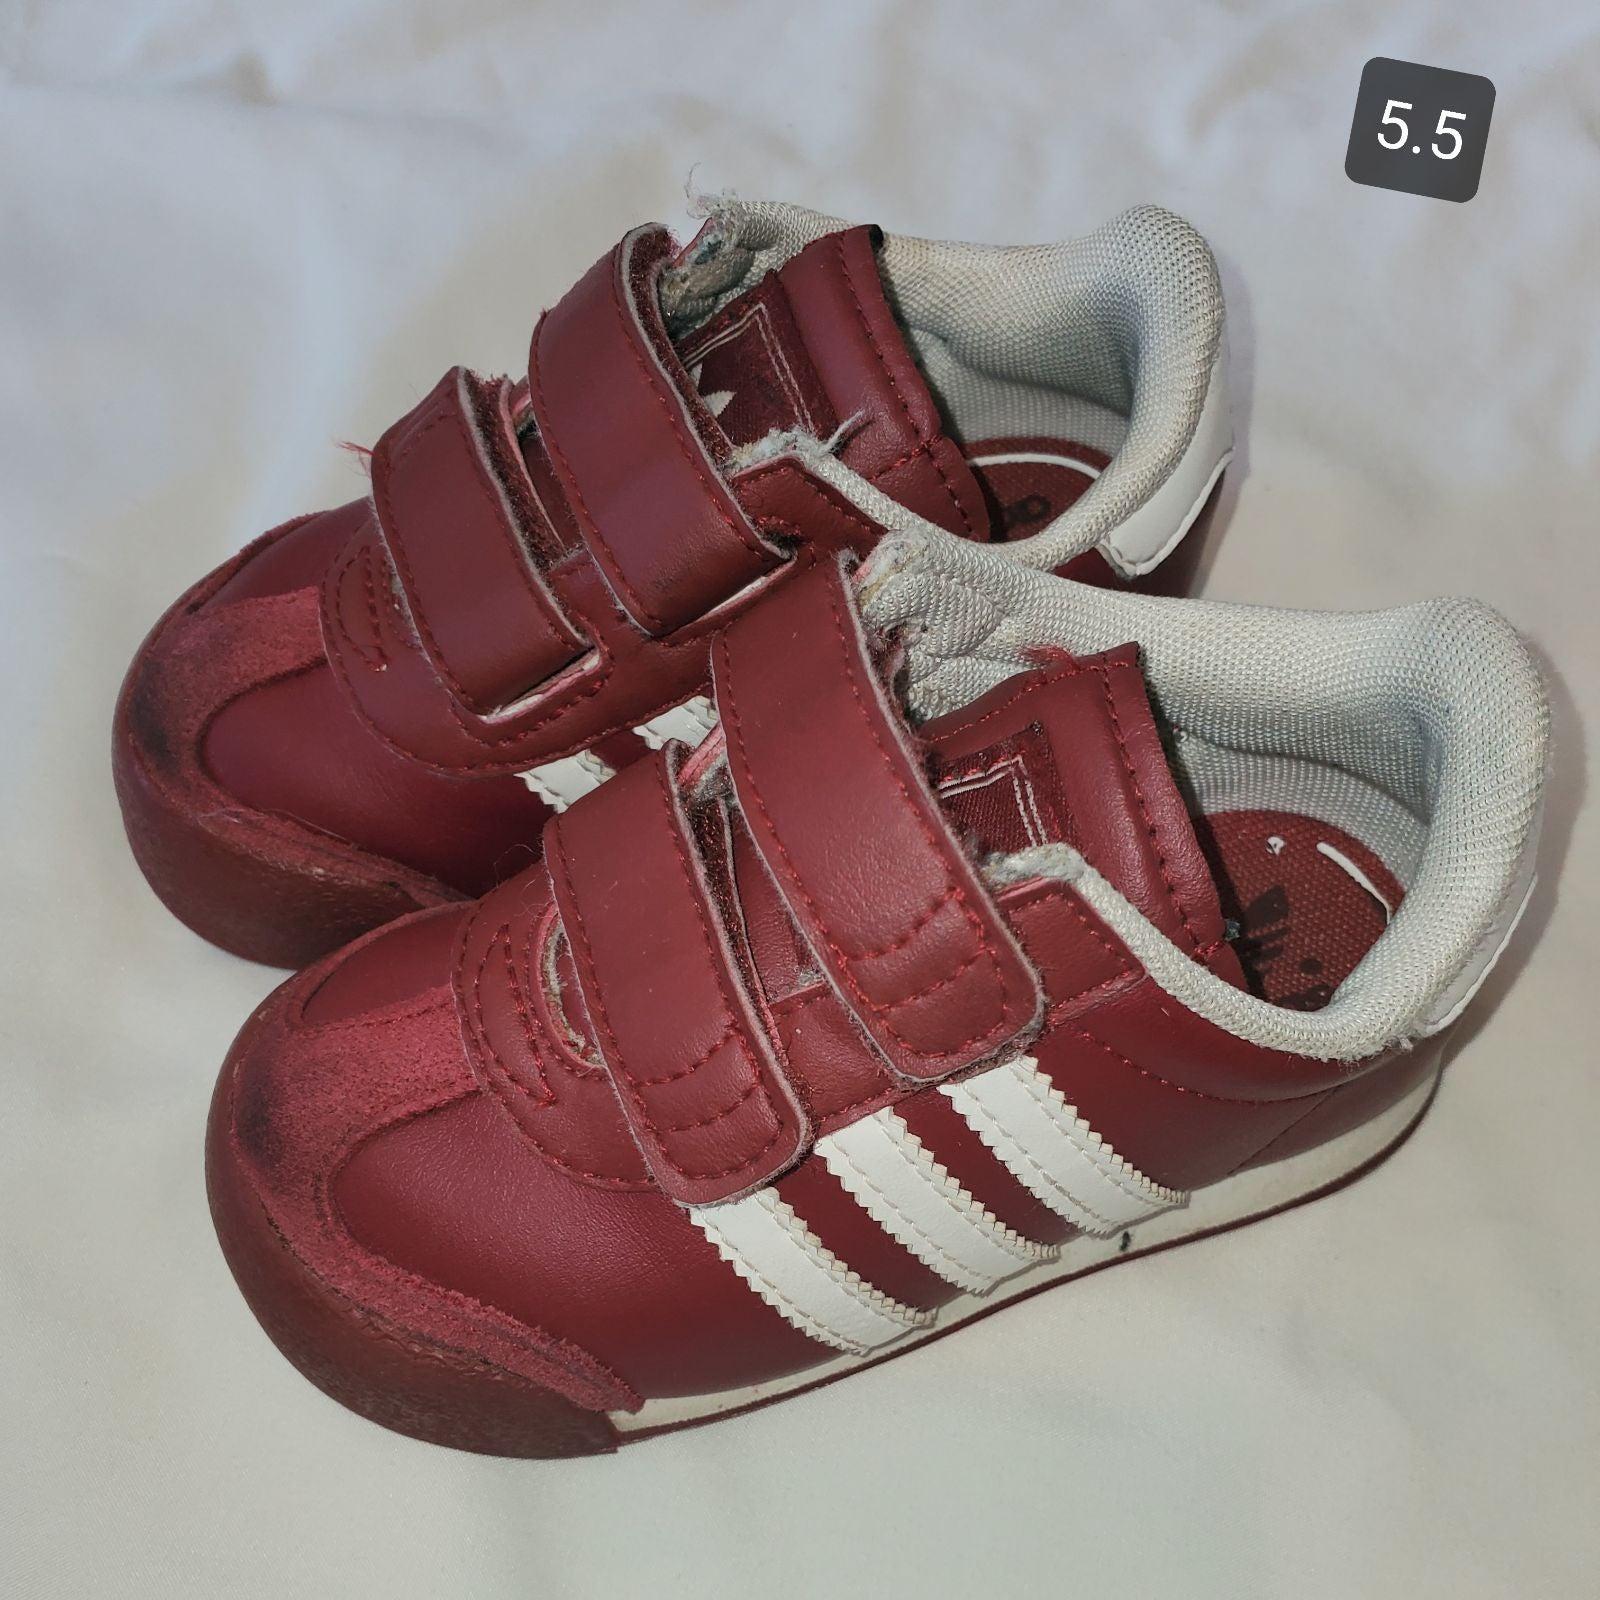 Adidas Shoes Toddler Boys 5.5